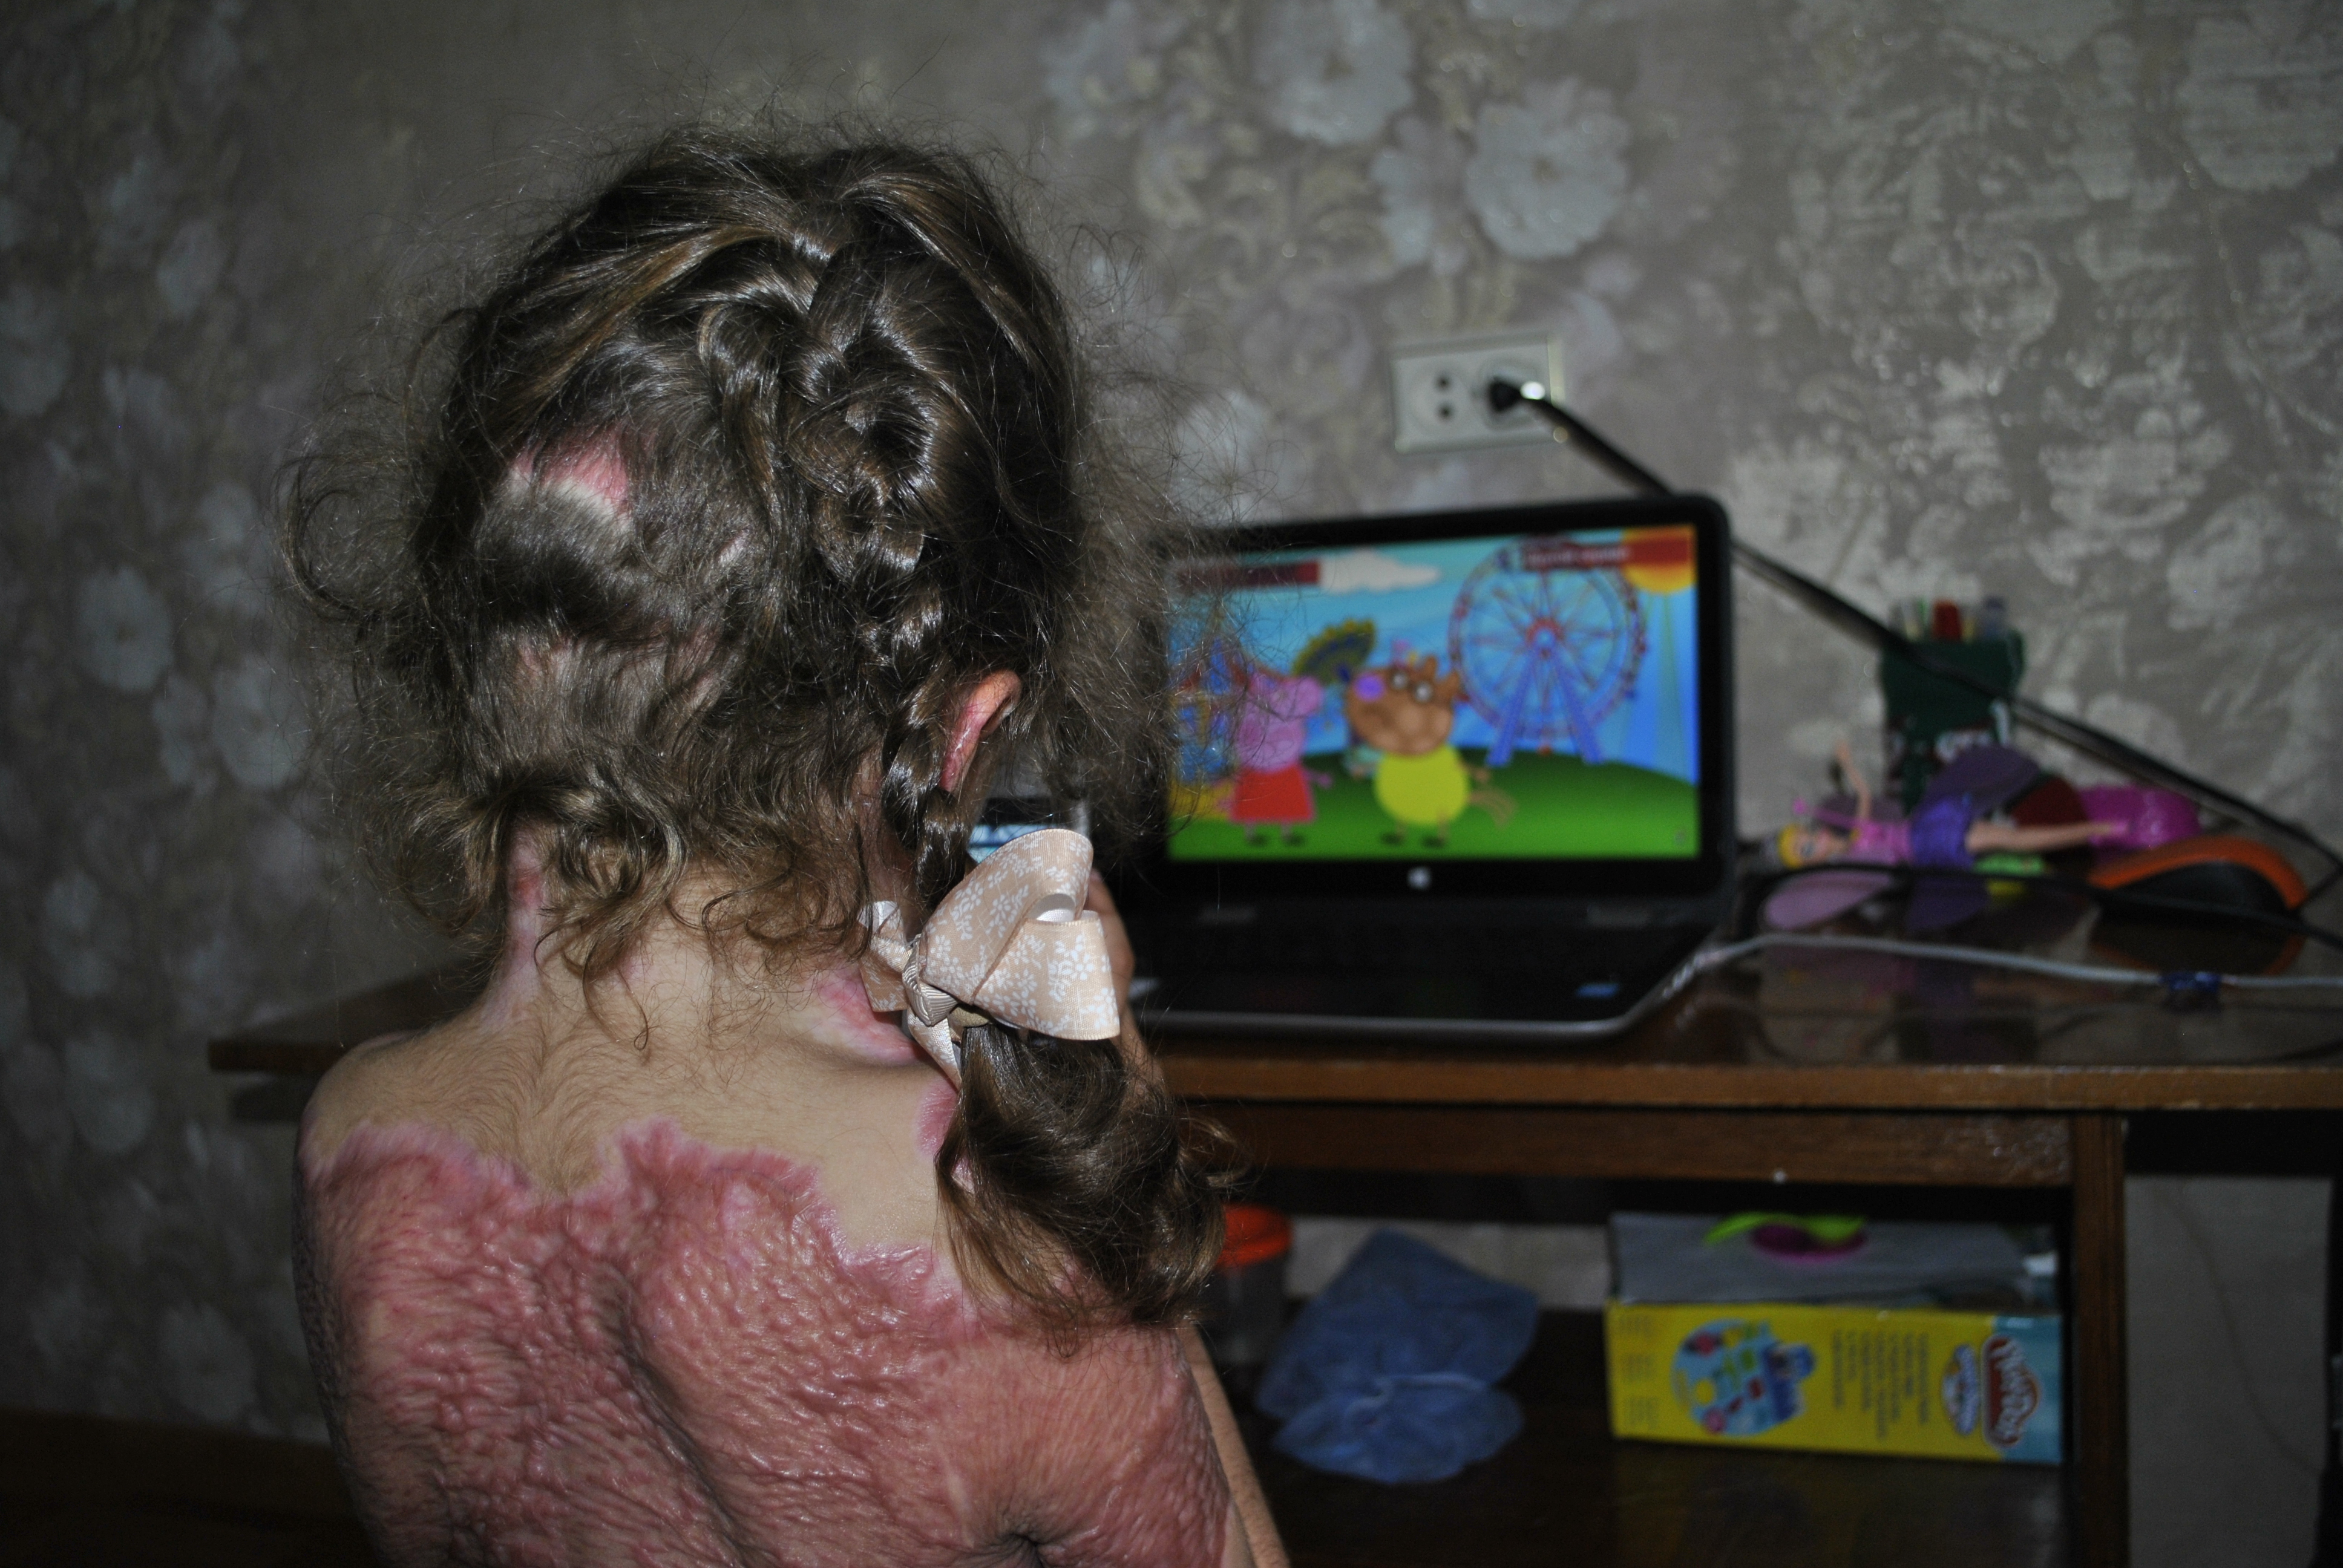 девочка захотела по ебатся видео